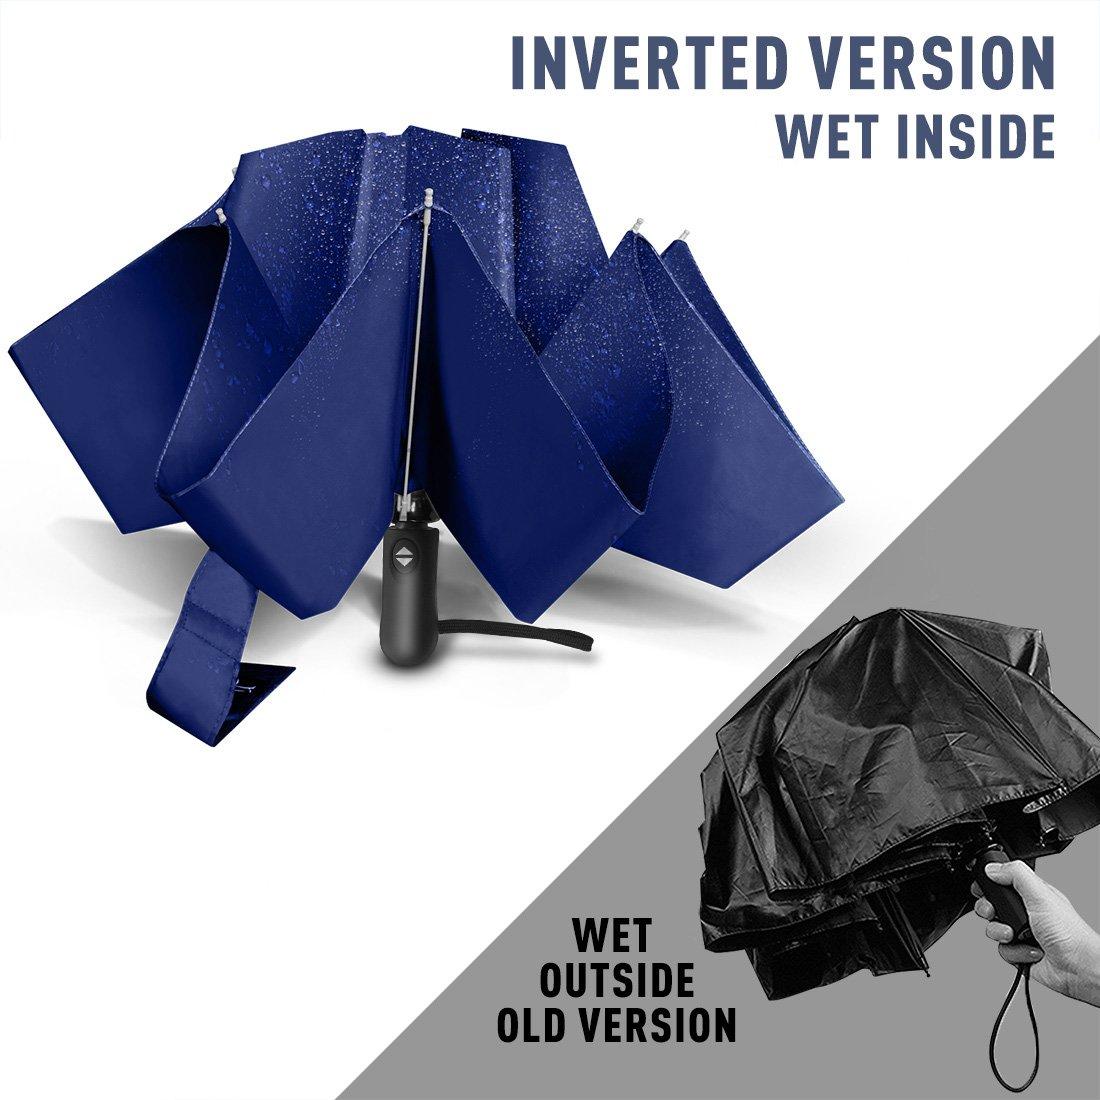 Nesus Umbrella Windproof Travel Umbrella 8 Ribs Auto Open Close with Waterproof Canopy Compact Folding Reverse Umbrella(Blue) by Nesus (Image #2)